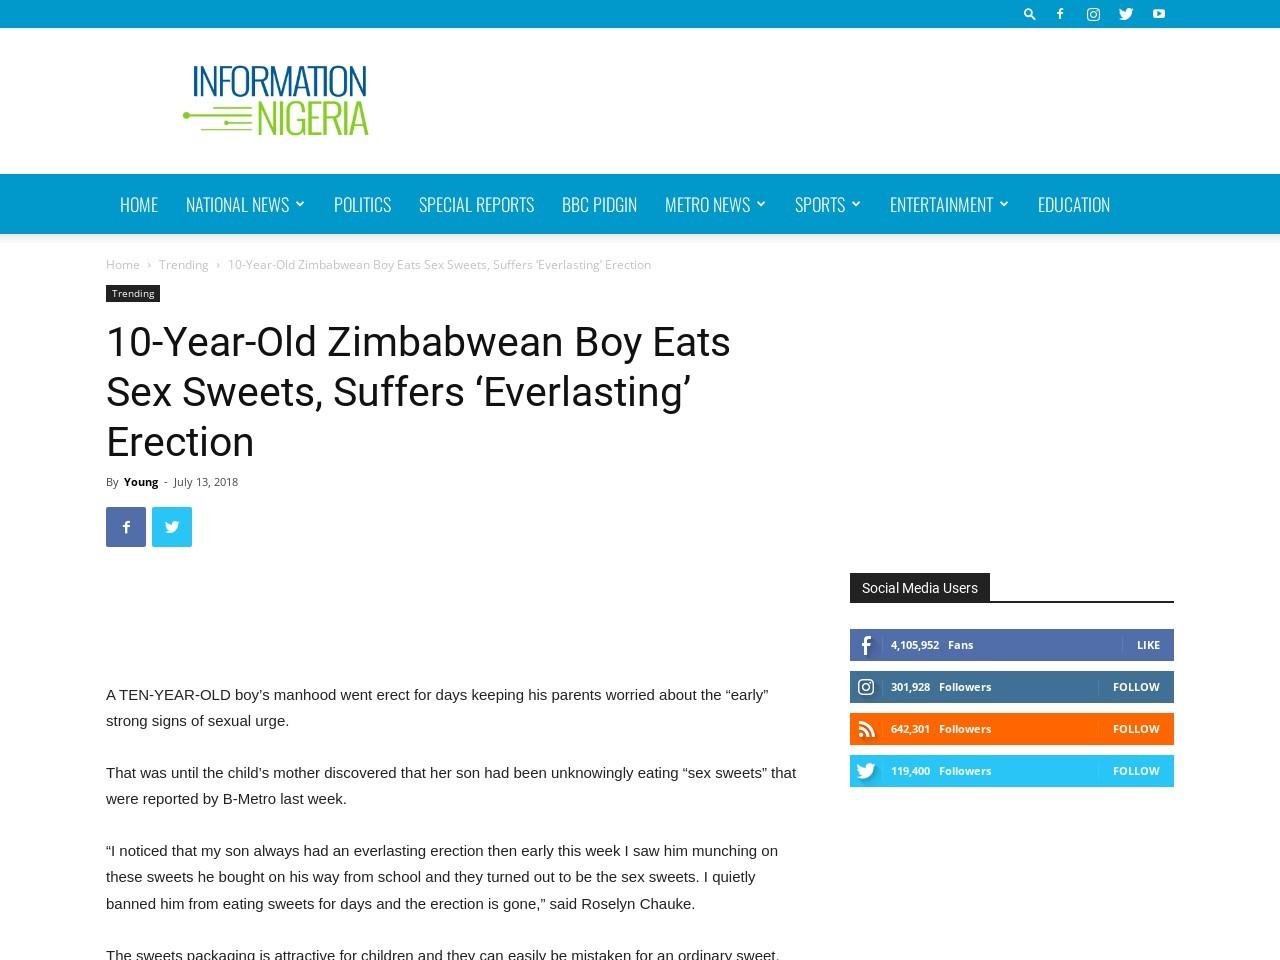 10-Year-Old Zimbabwean Boy Eats Sex Sweets, Suffers 'Everlasting' Erection